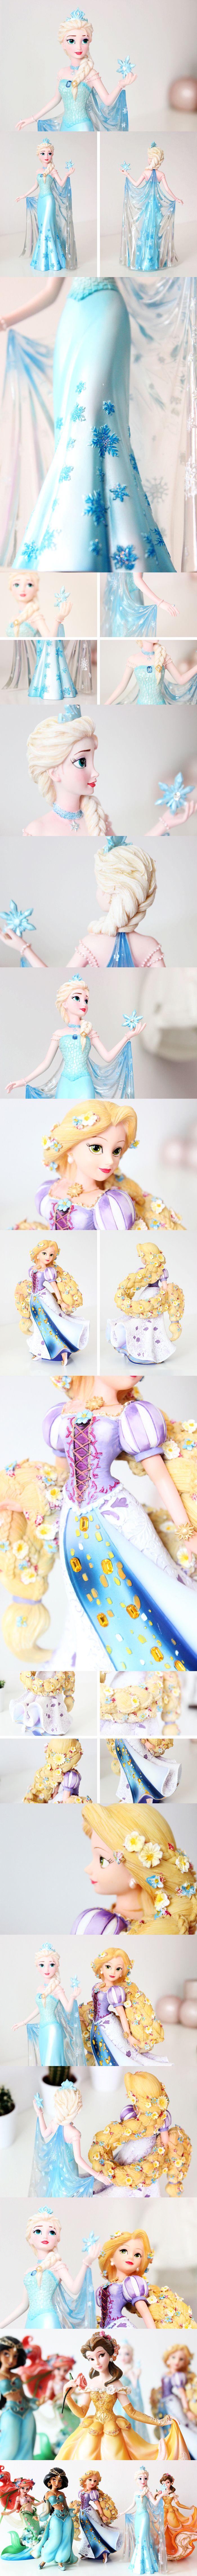 My Disney Princess Couture de Force Collection from Disney Showcase | Rapunzel, Elsa, Belle, Jasmine, Ariel | Frozen | Figurines, collectibles, statues, resin